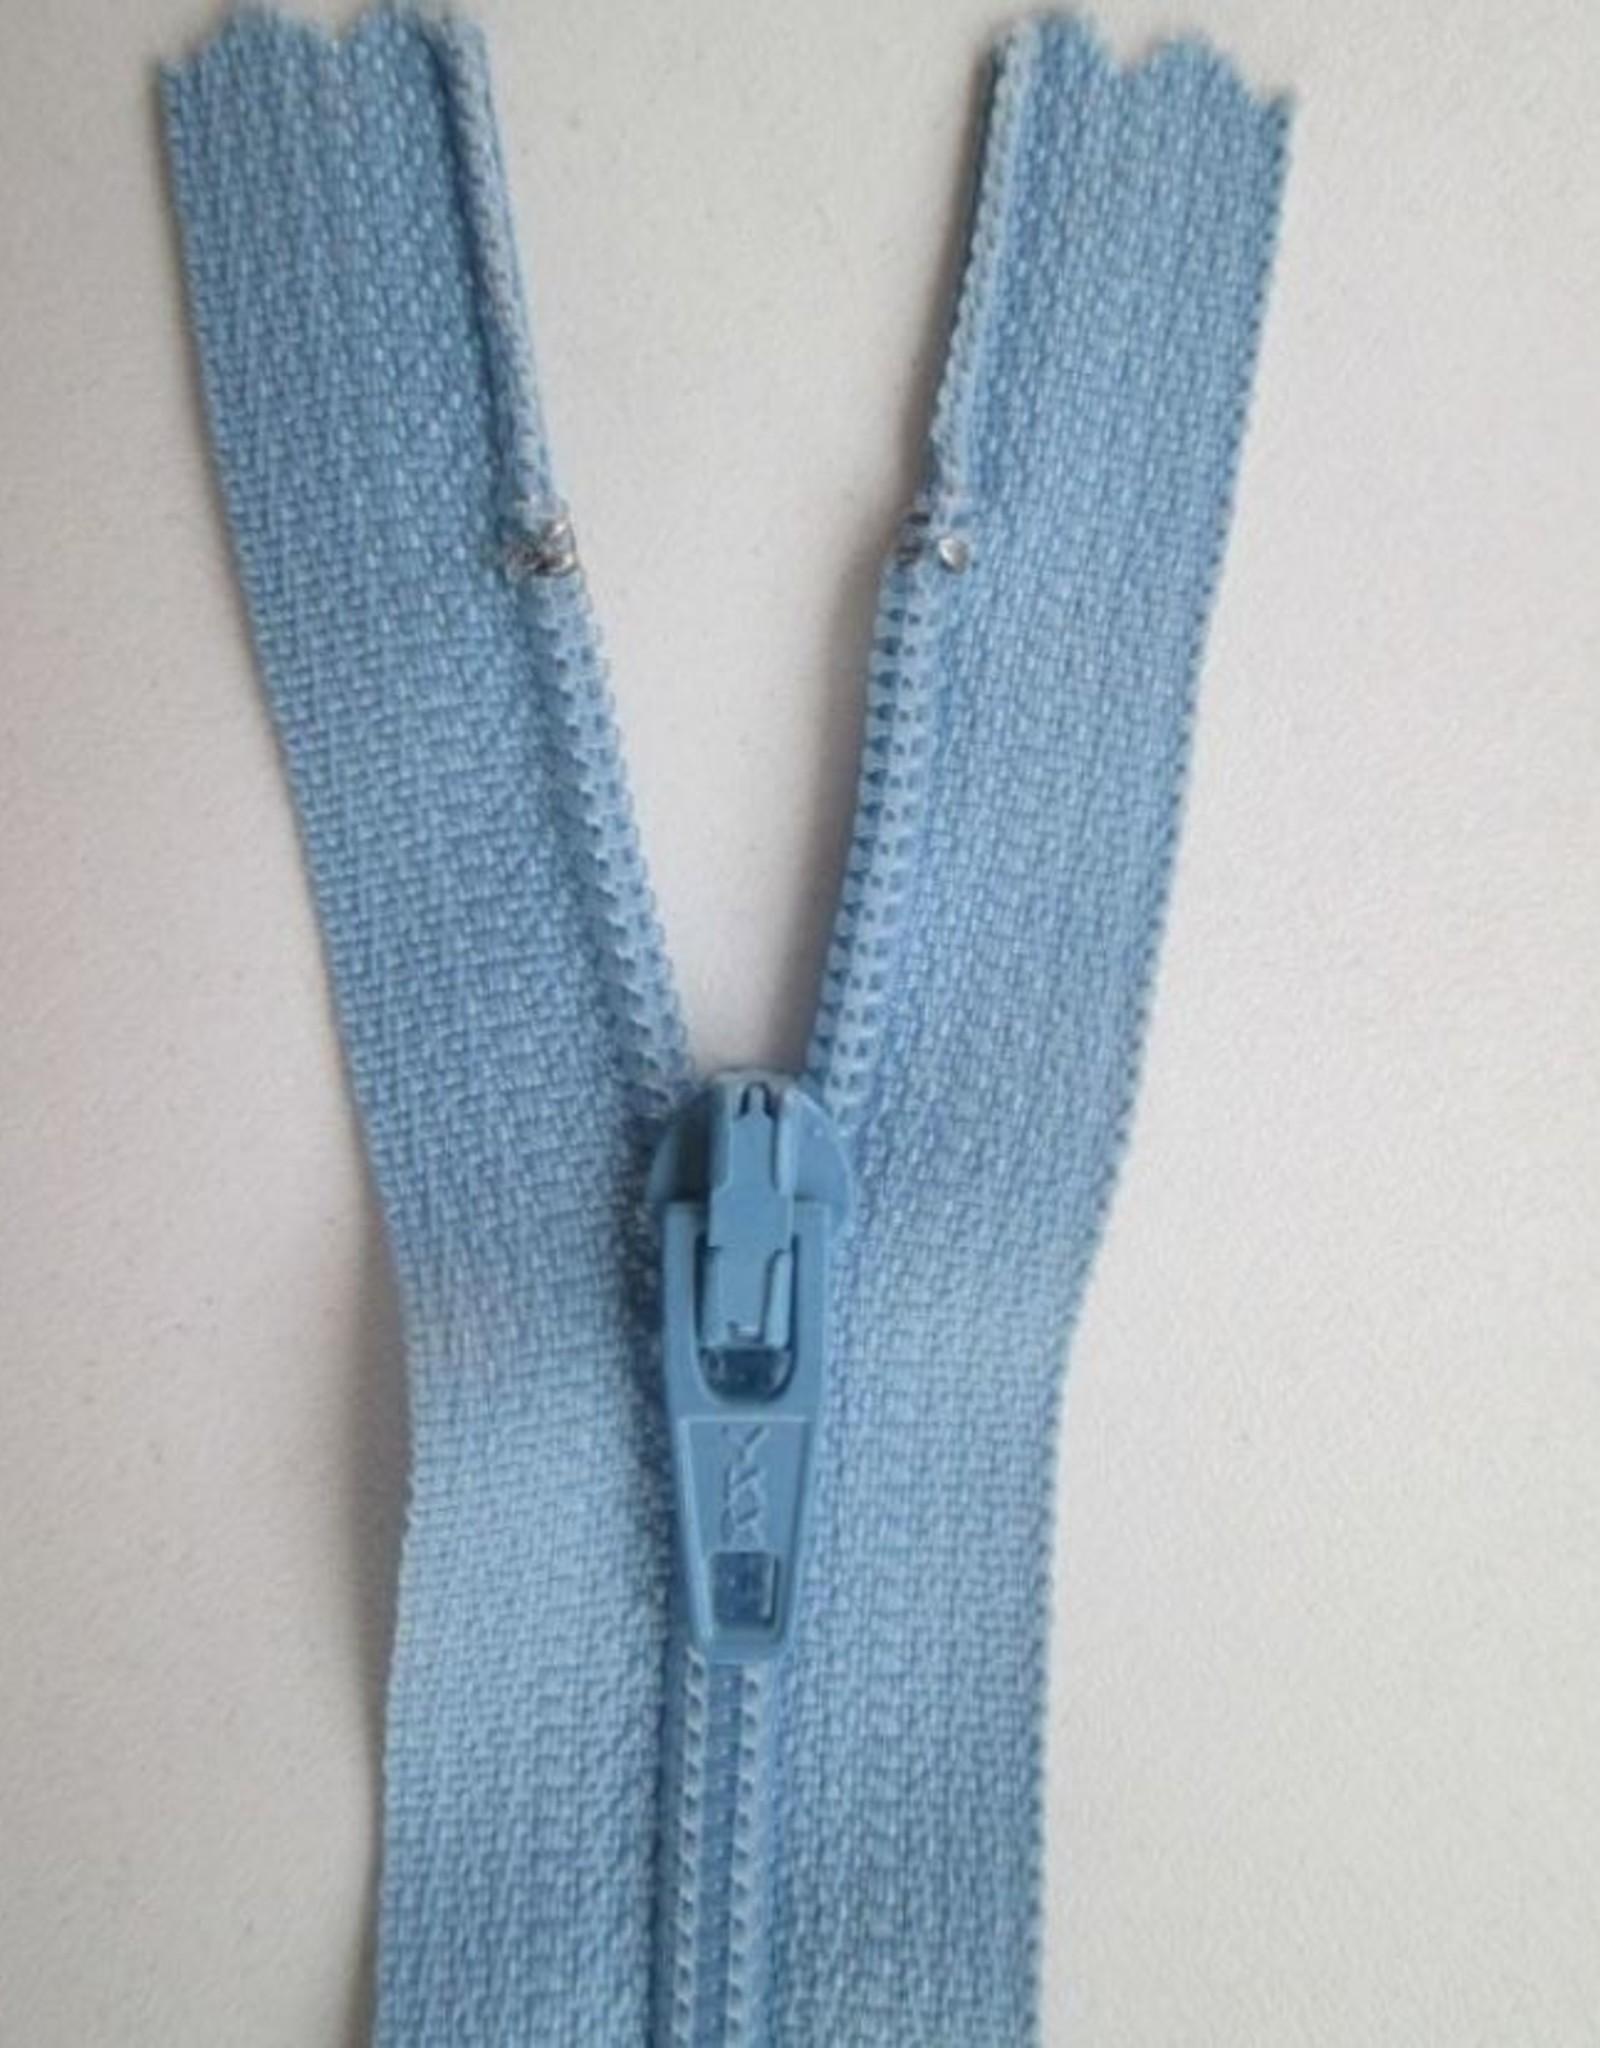 YKK Spiraalrits niet-DB 3mm midden blauw 546-22cm